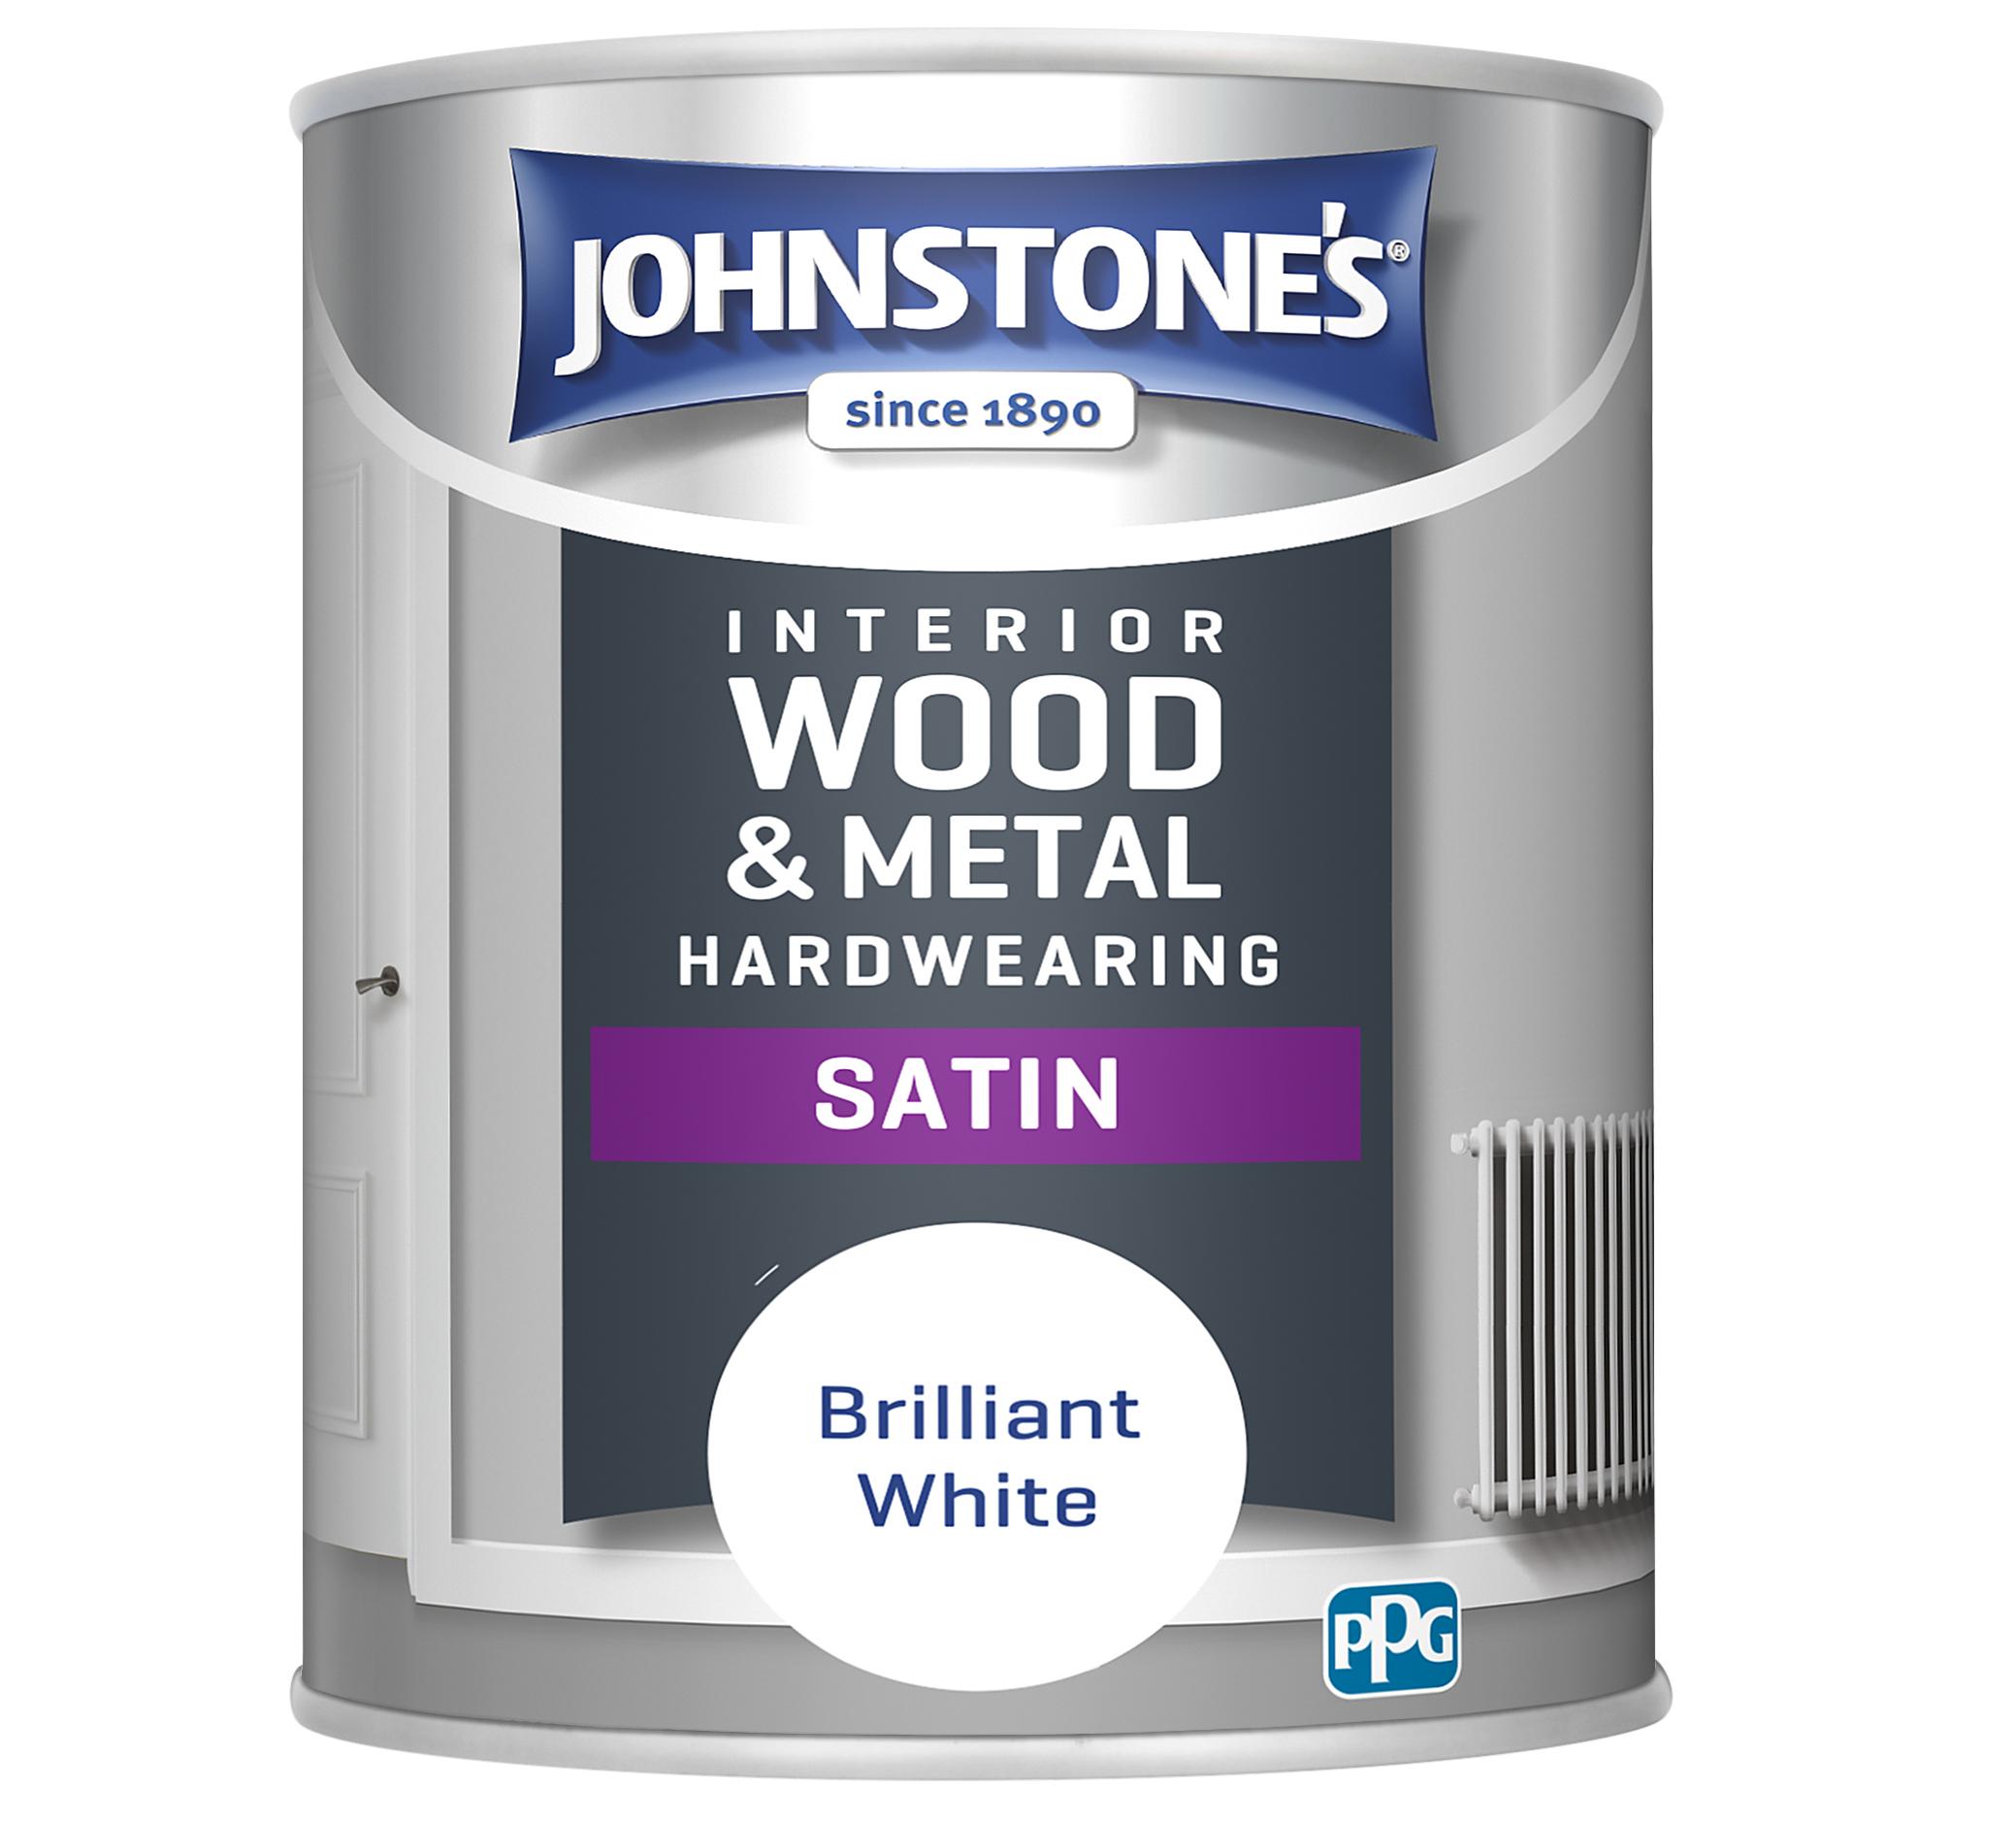 Johnstones 750ml Hardwearing Satin - Brilliant White